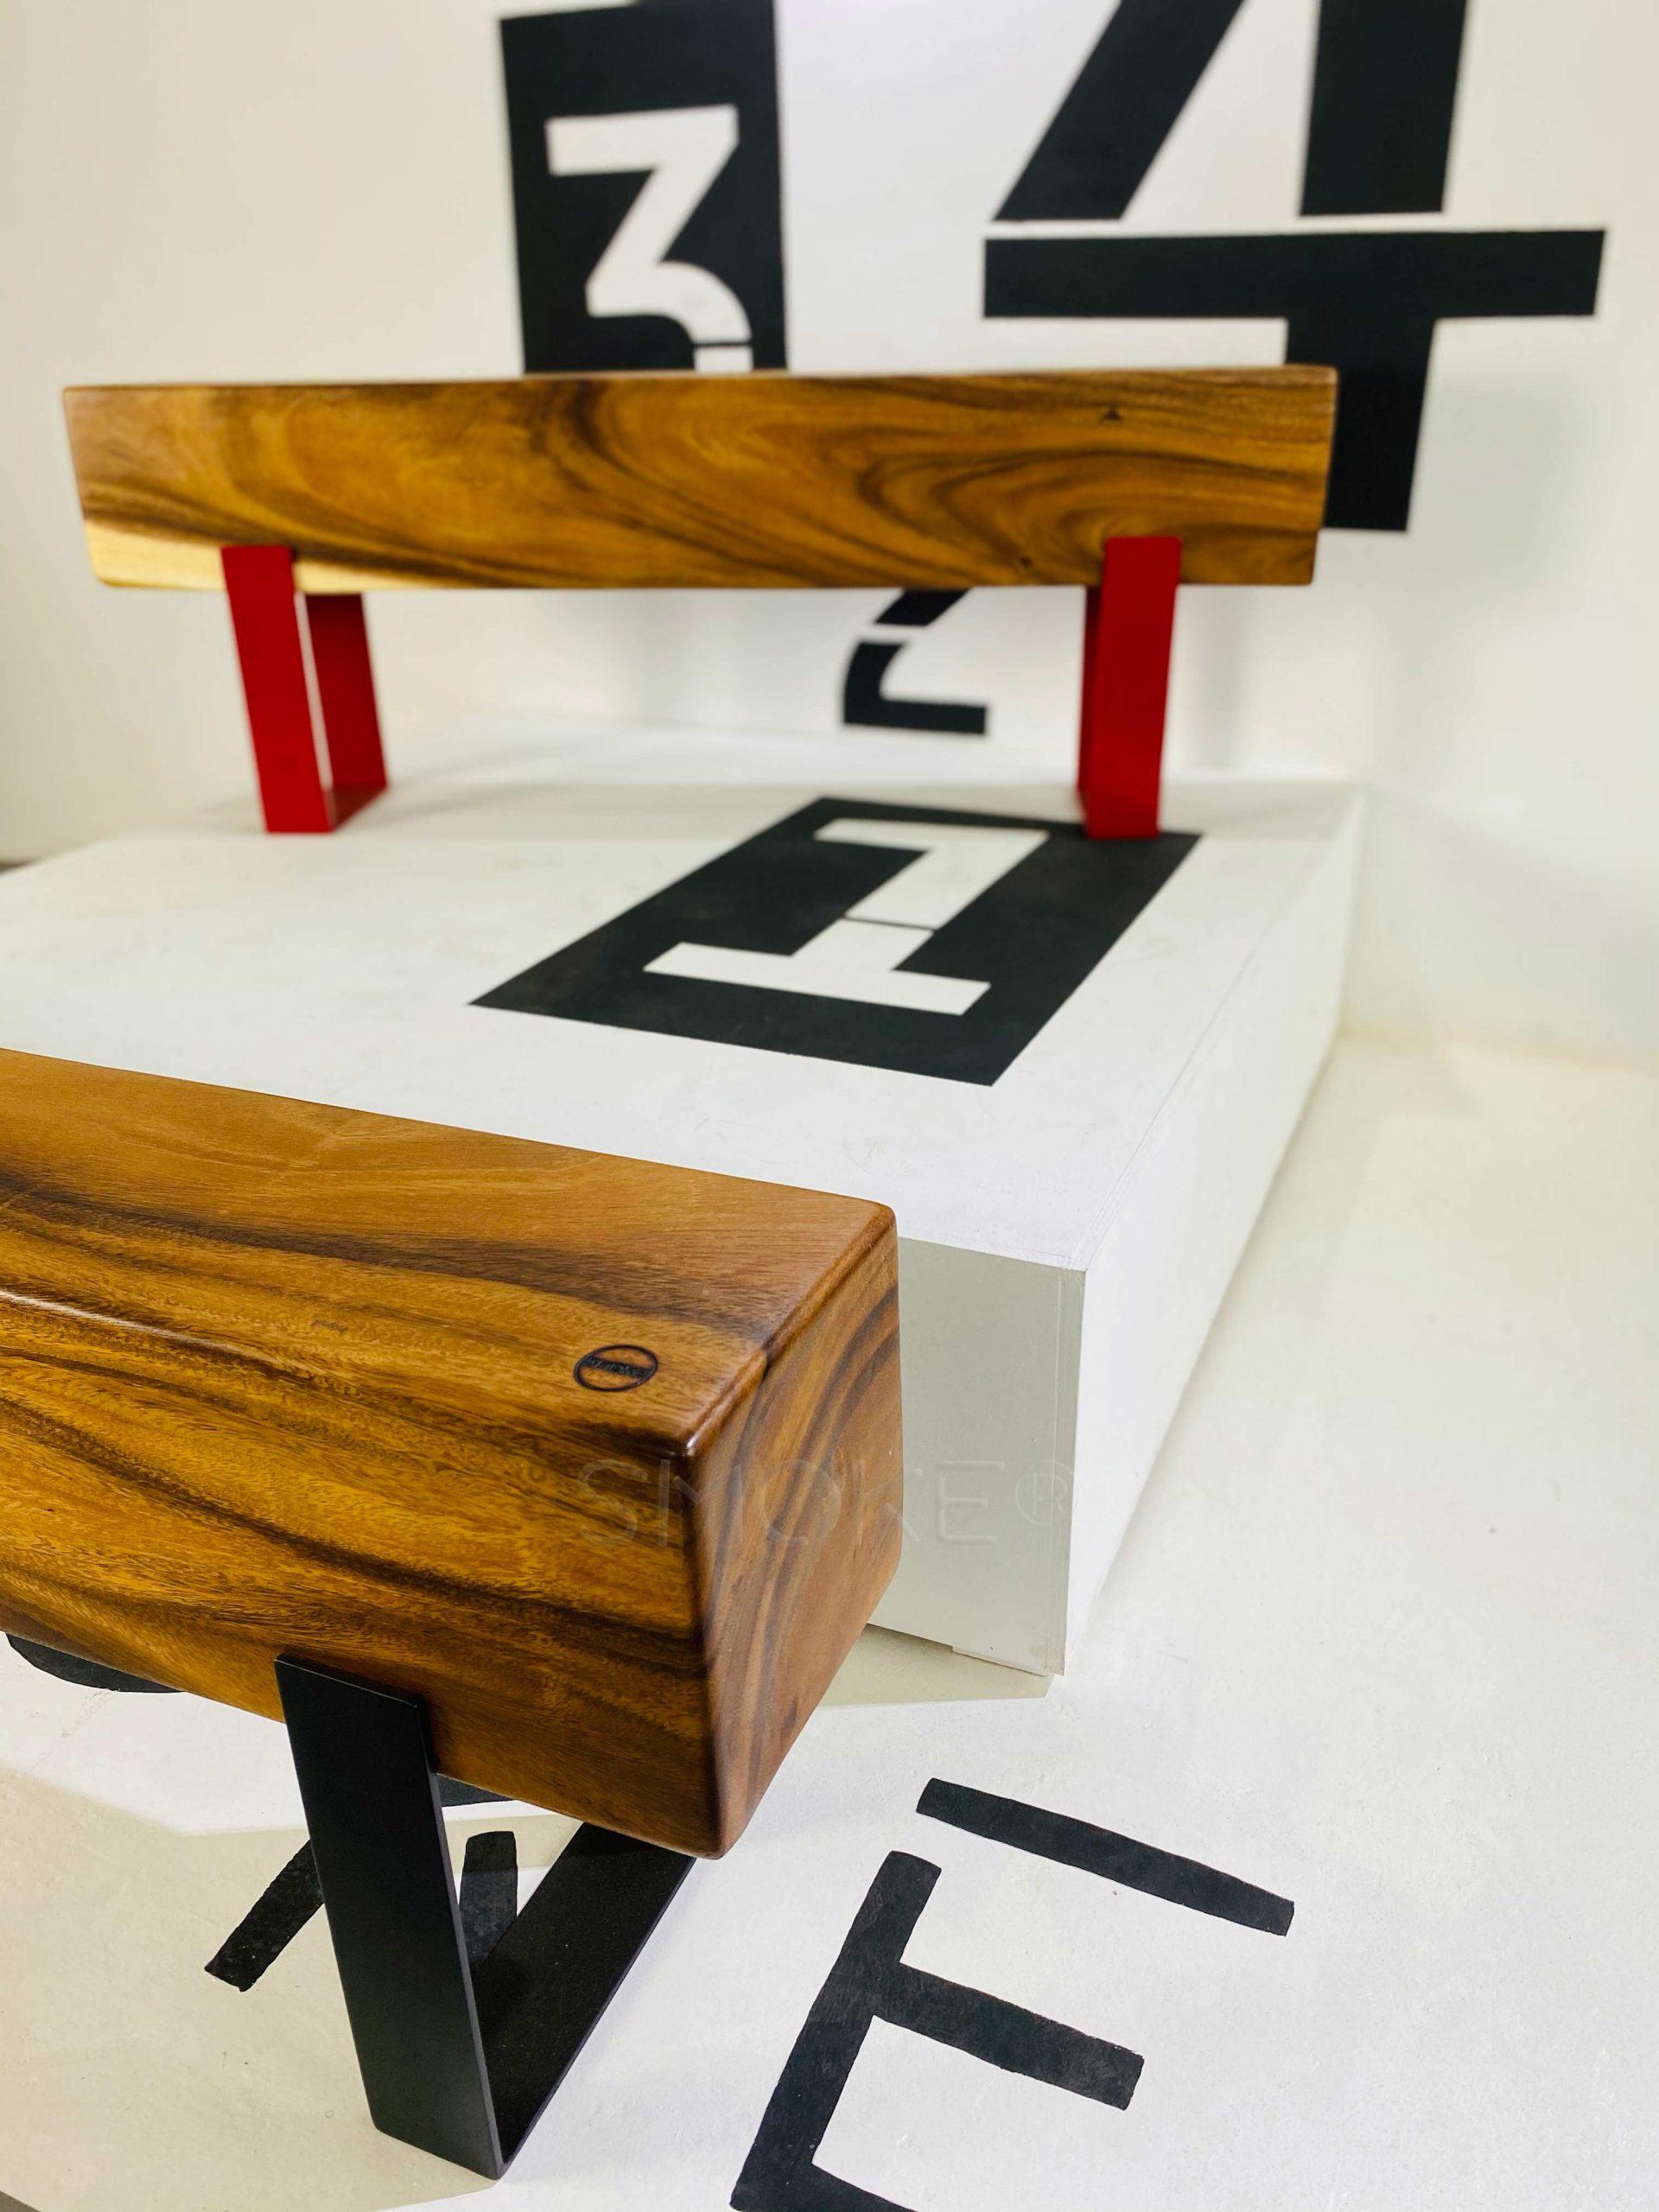 Logan Scarlet Wooden Bench Perspective Display